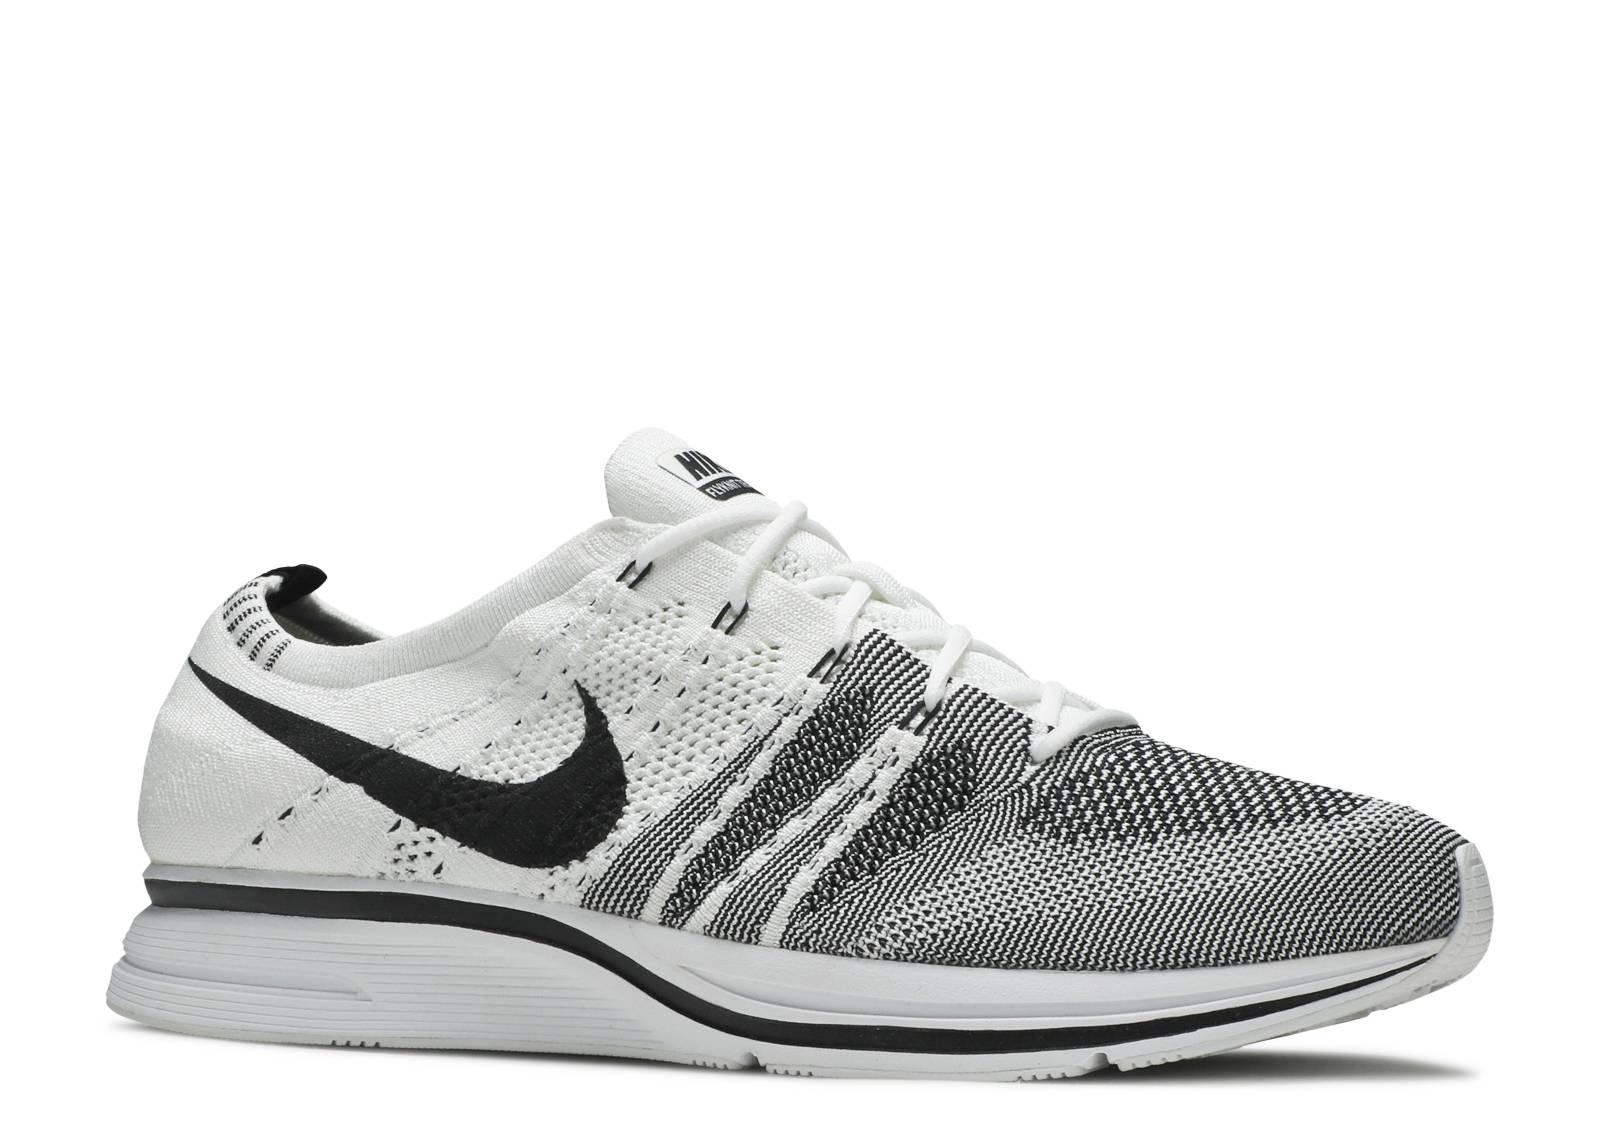 655c48291a5e Nike Flyknit Trainer - Nike - ah8396 100 - white black-white ...